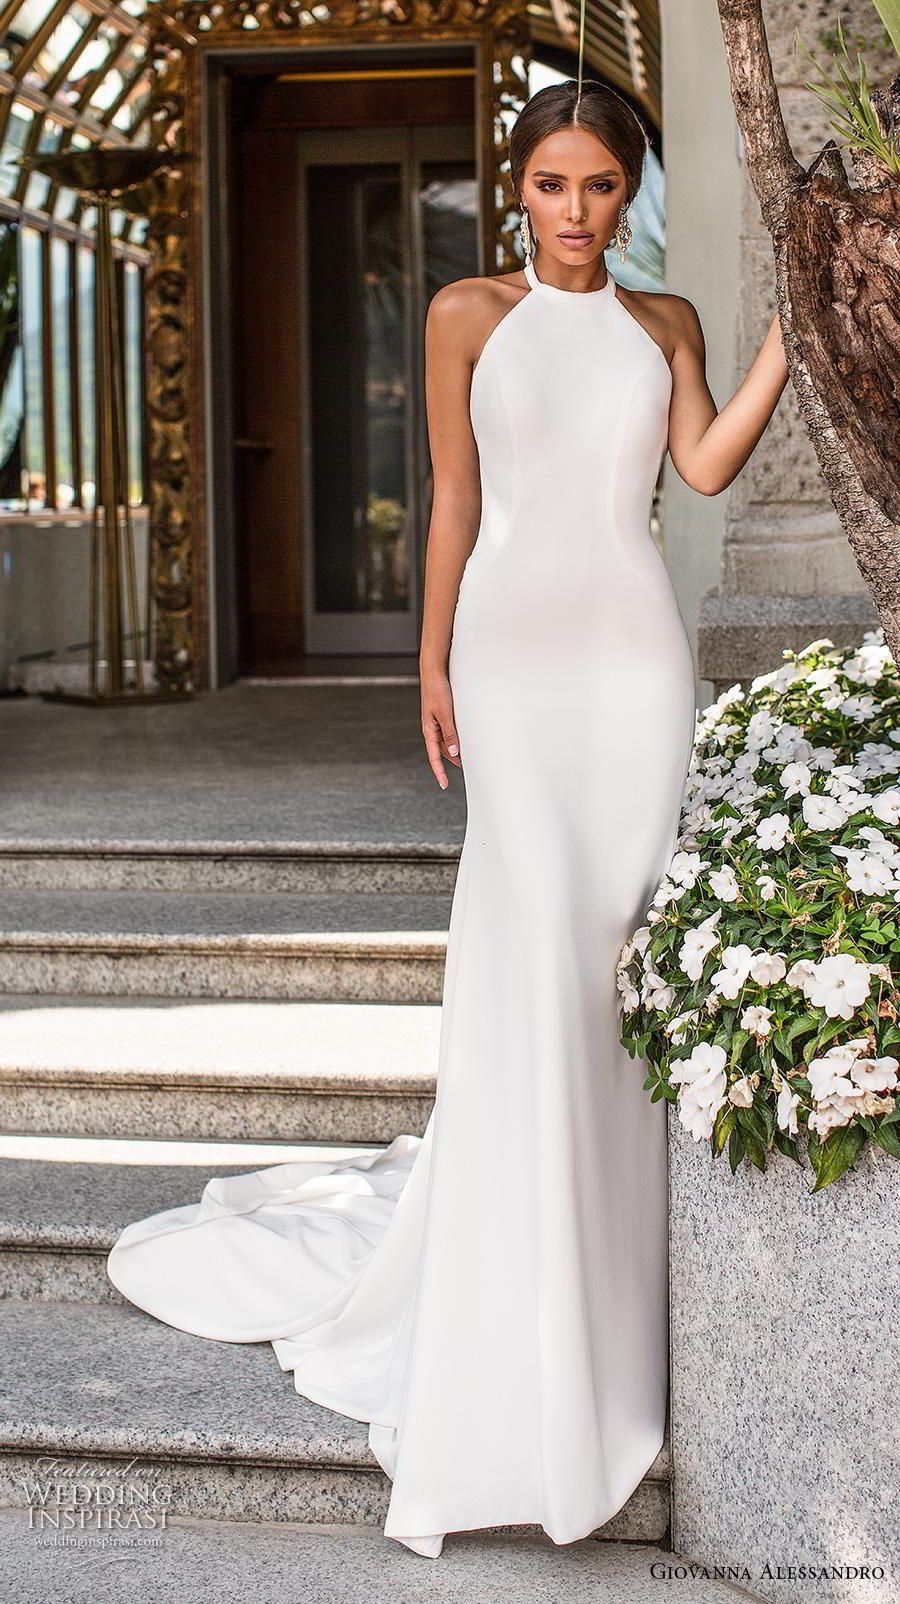 Giovanna Alessandro 2019 Wedding Dresses Magica Milano Bridal Collection Wedding Inspirasi Sheath Wedding Dress Backless Halter Wedding Dress Top Wedding Dresses [ 1604 x 900 Pixel ]